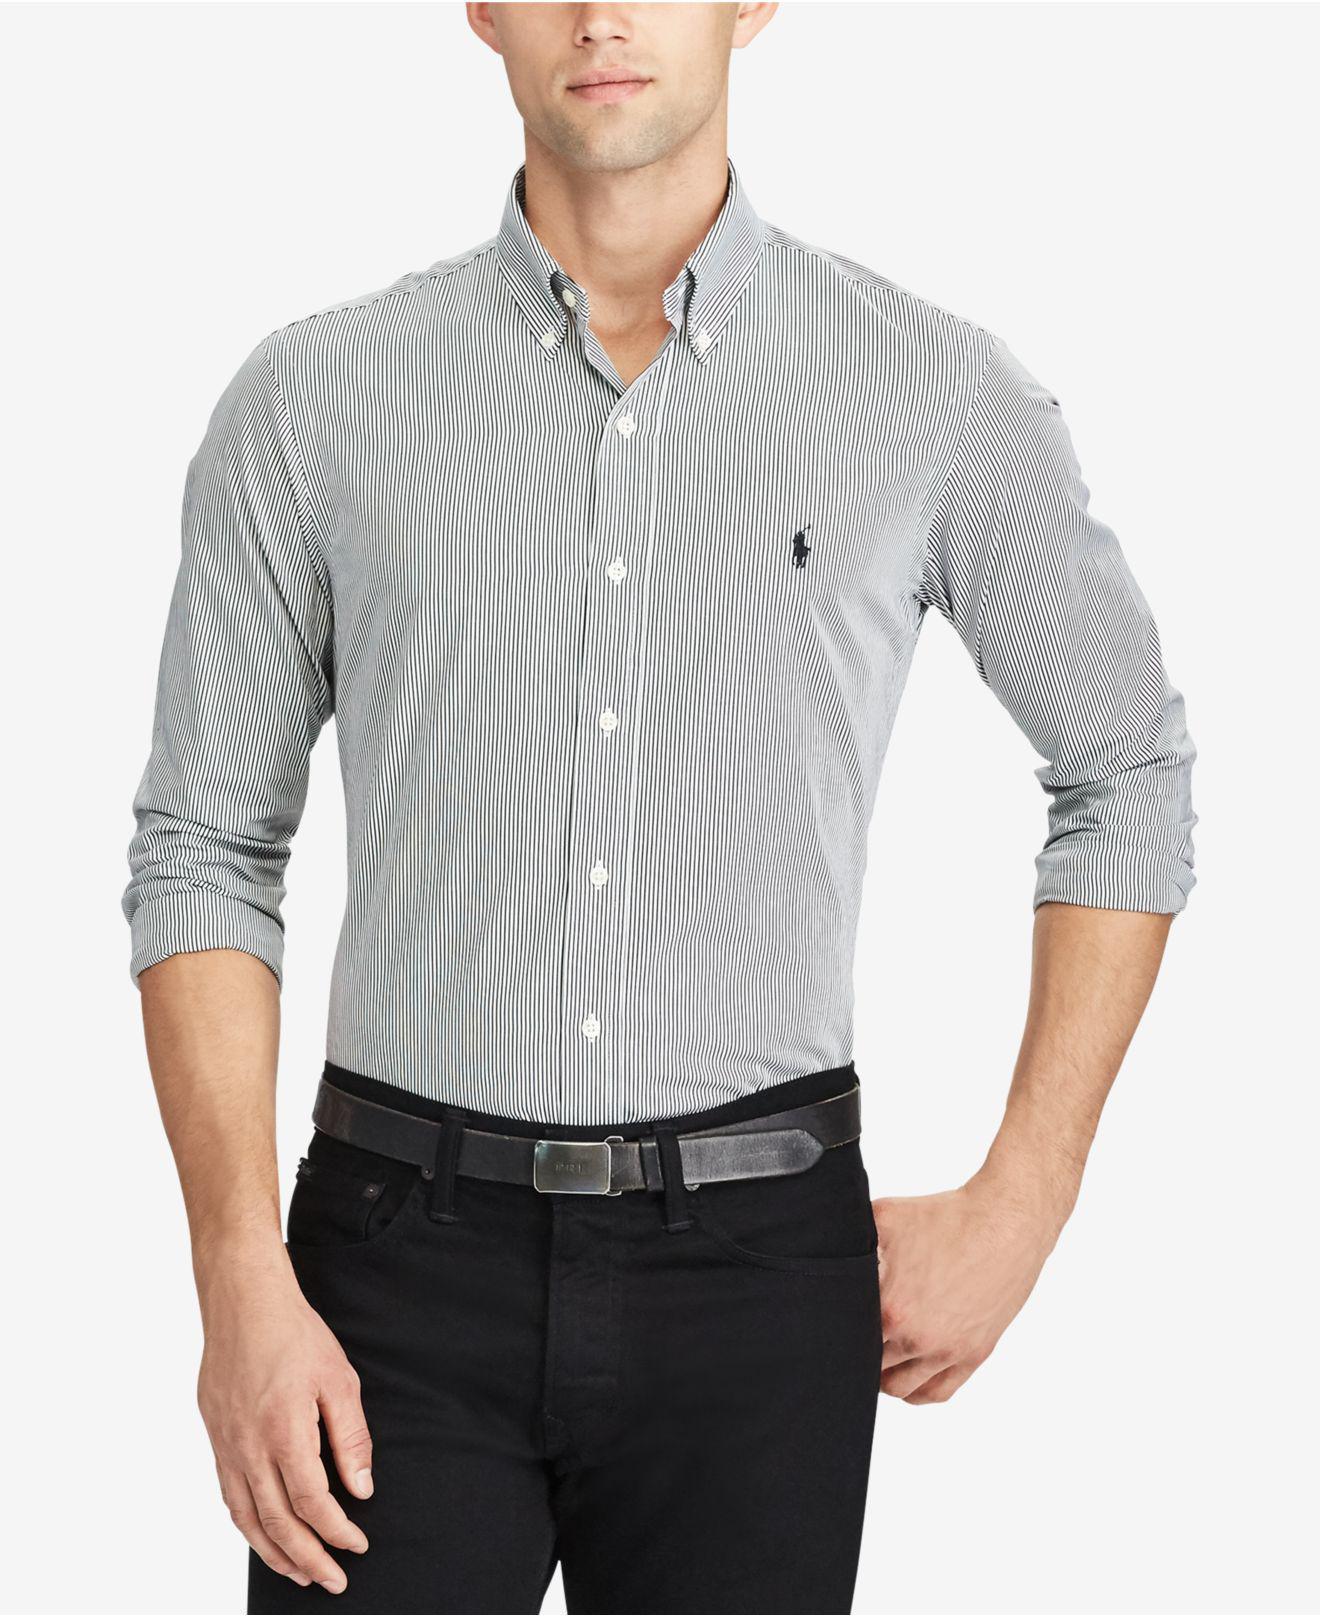 fae37ece2bb Polo Ralph Lauren Black And White Striped Dress Shirt - Gomes Weine AG